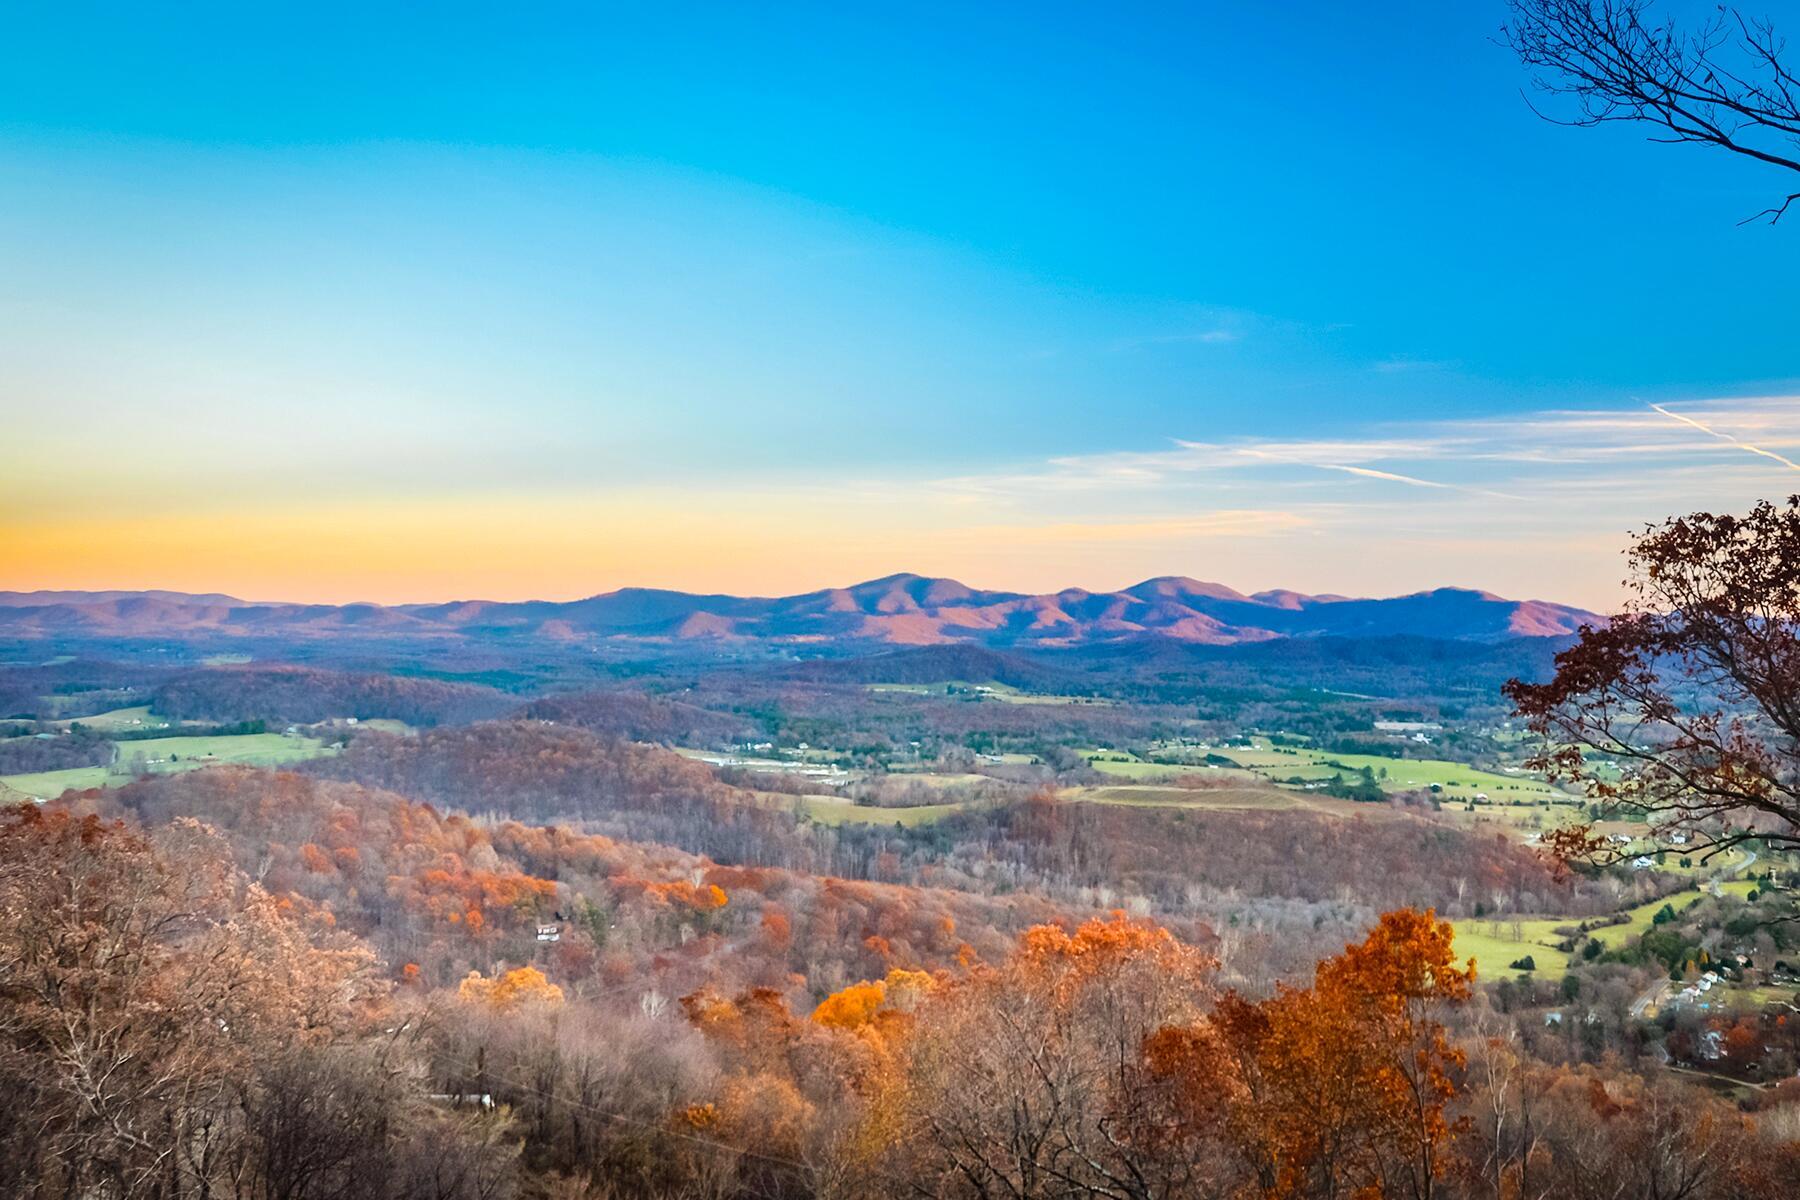 Roanoke to Staunton, Virginia